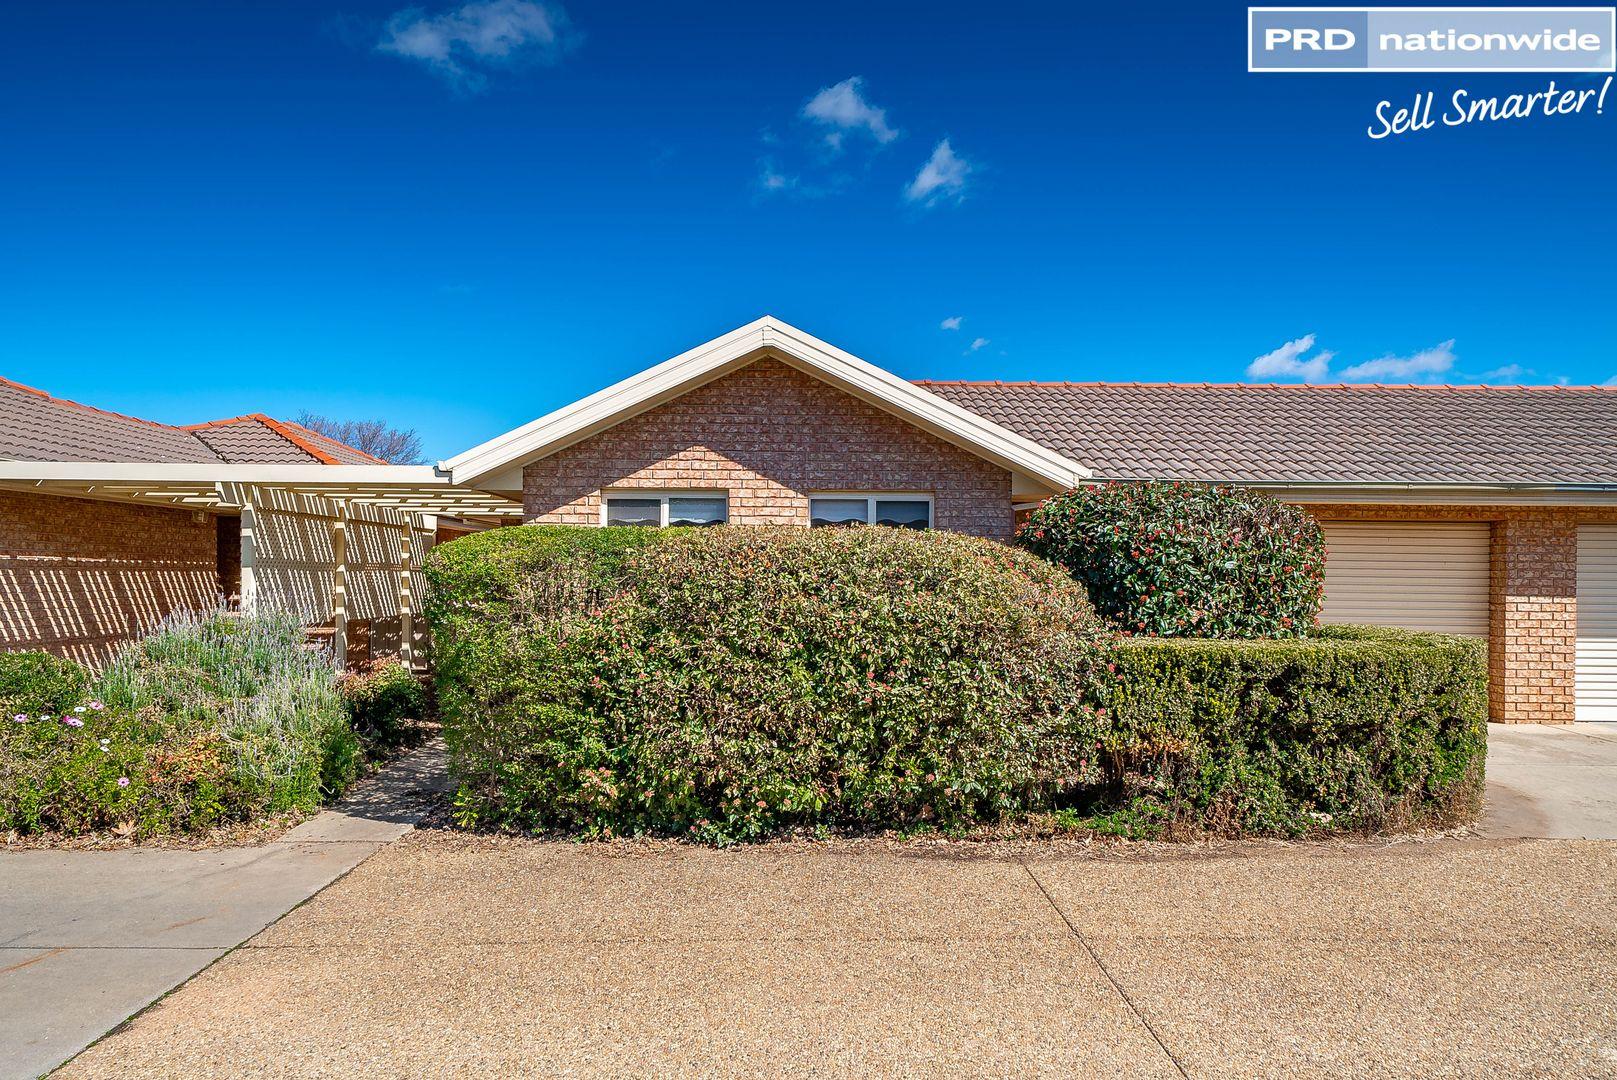 22/200 Fitzmaurice Street, Wagga Wagga NSW 2650, Image 0